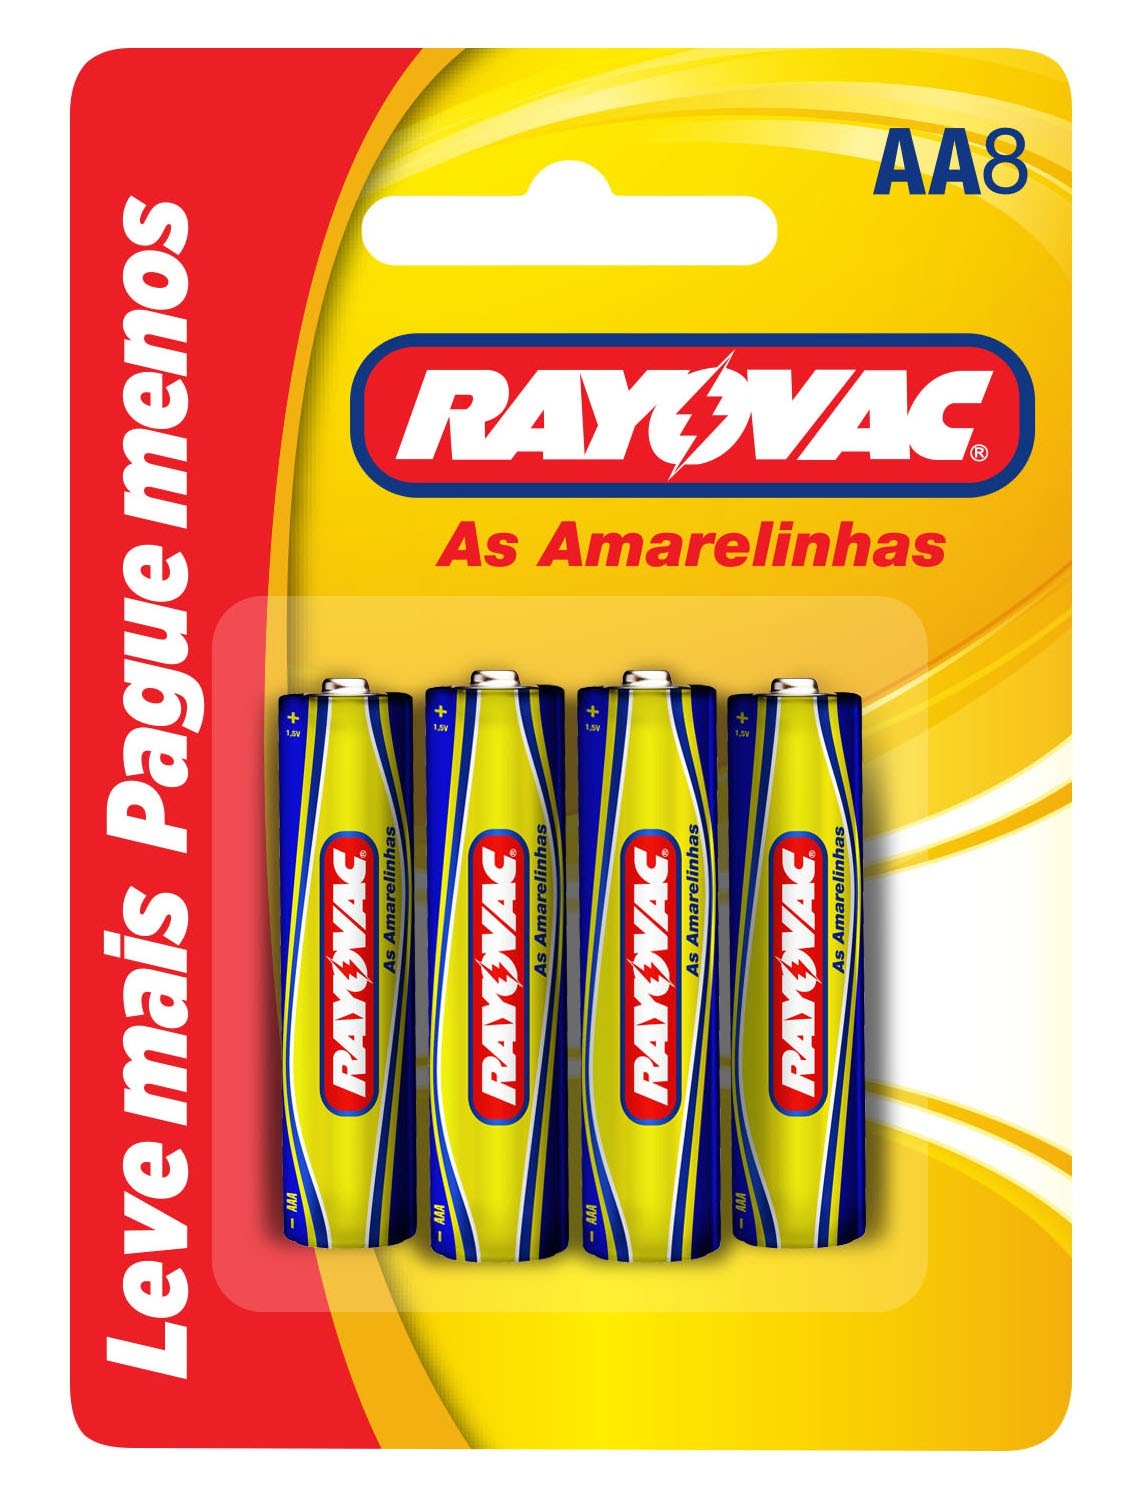 24 Pilhas AA Zinco Carvão RAYOVAC 3 cartelas